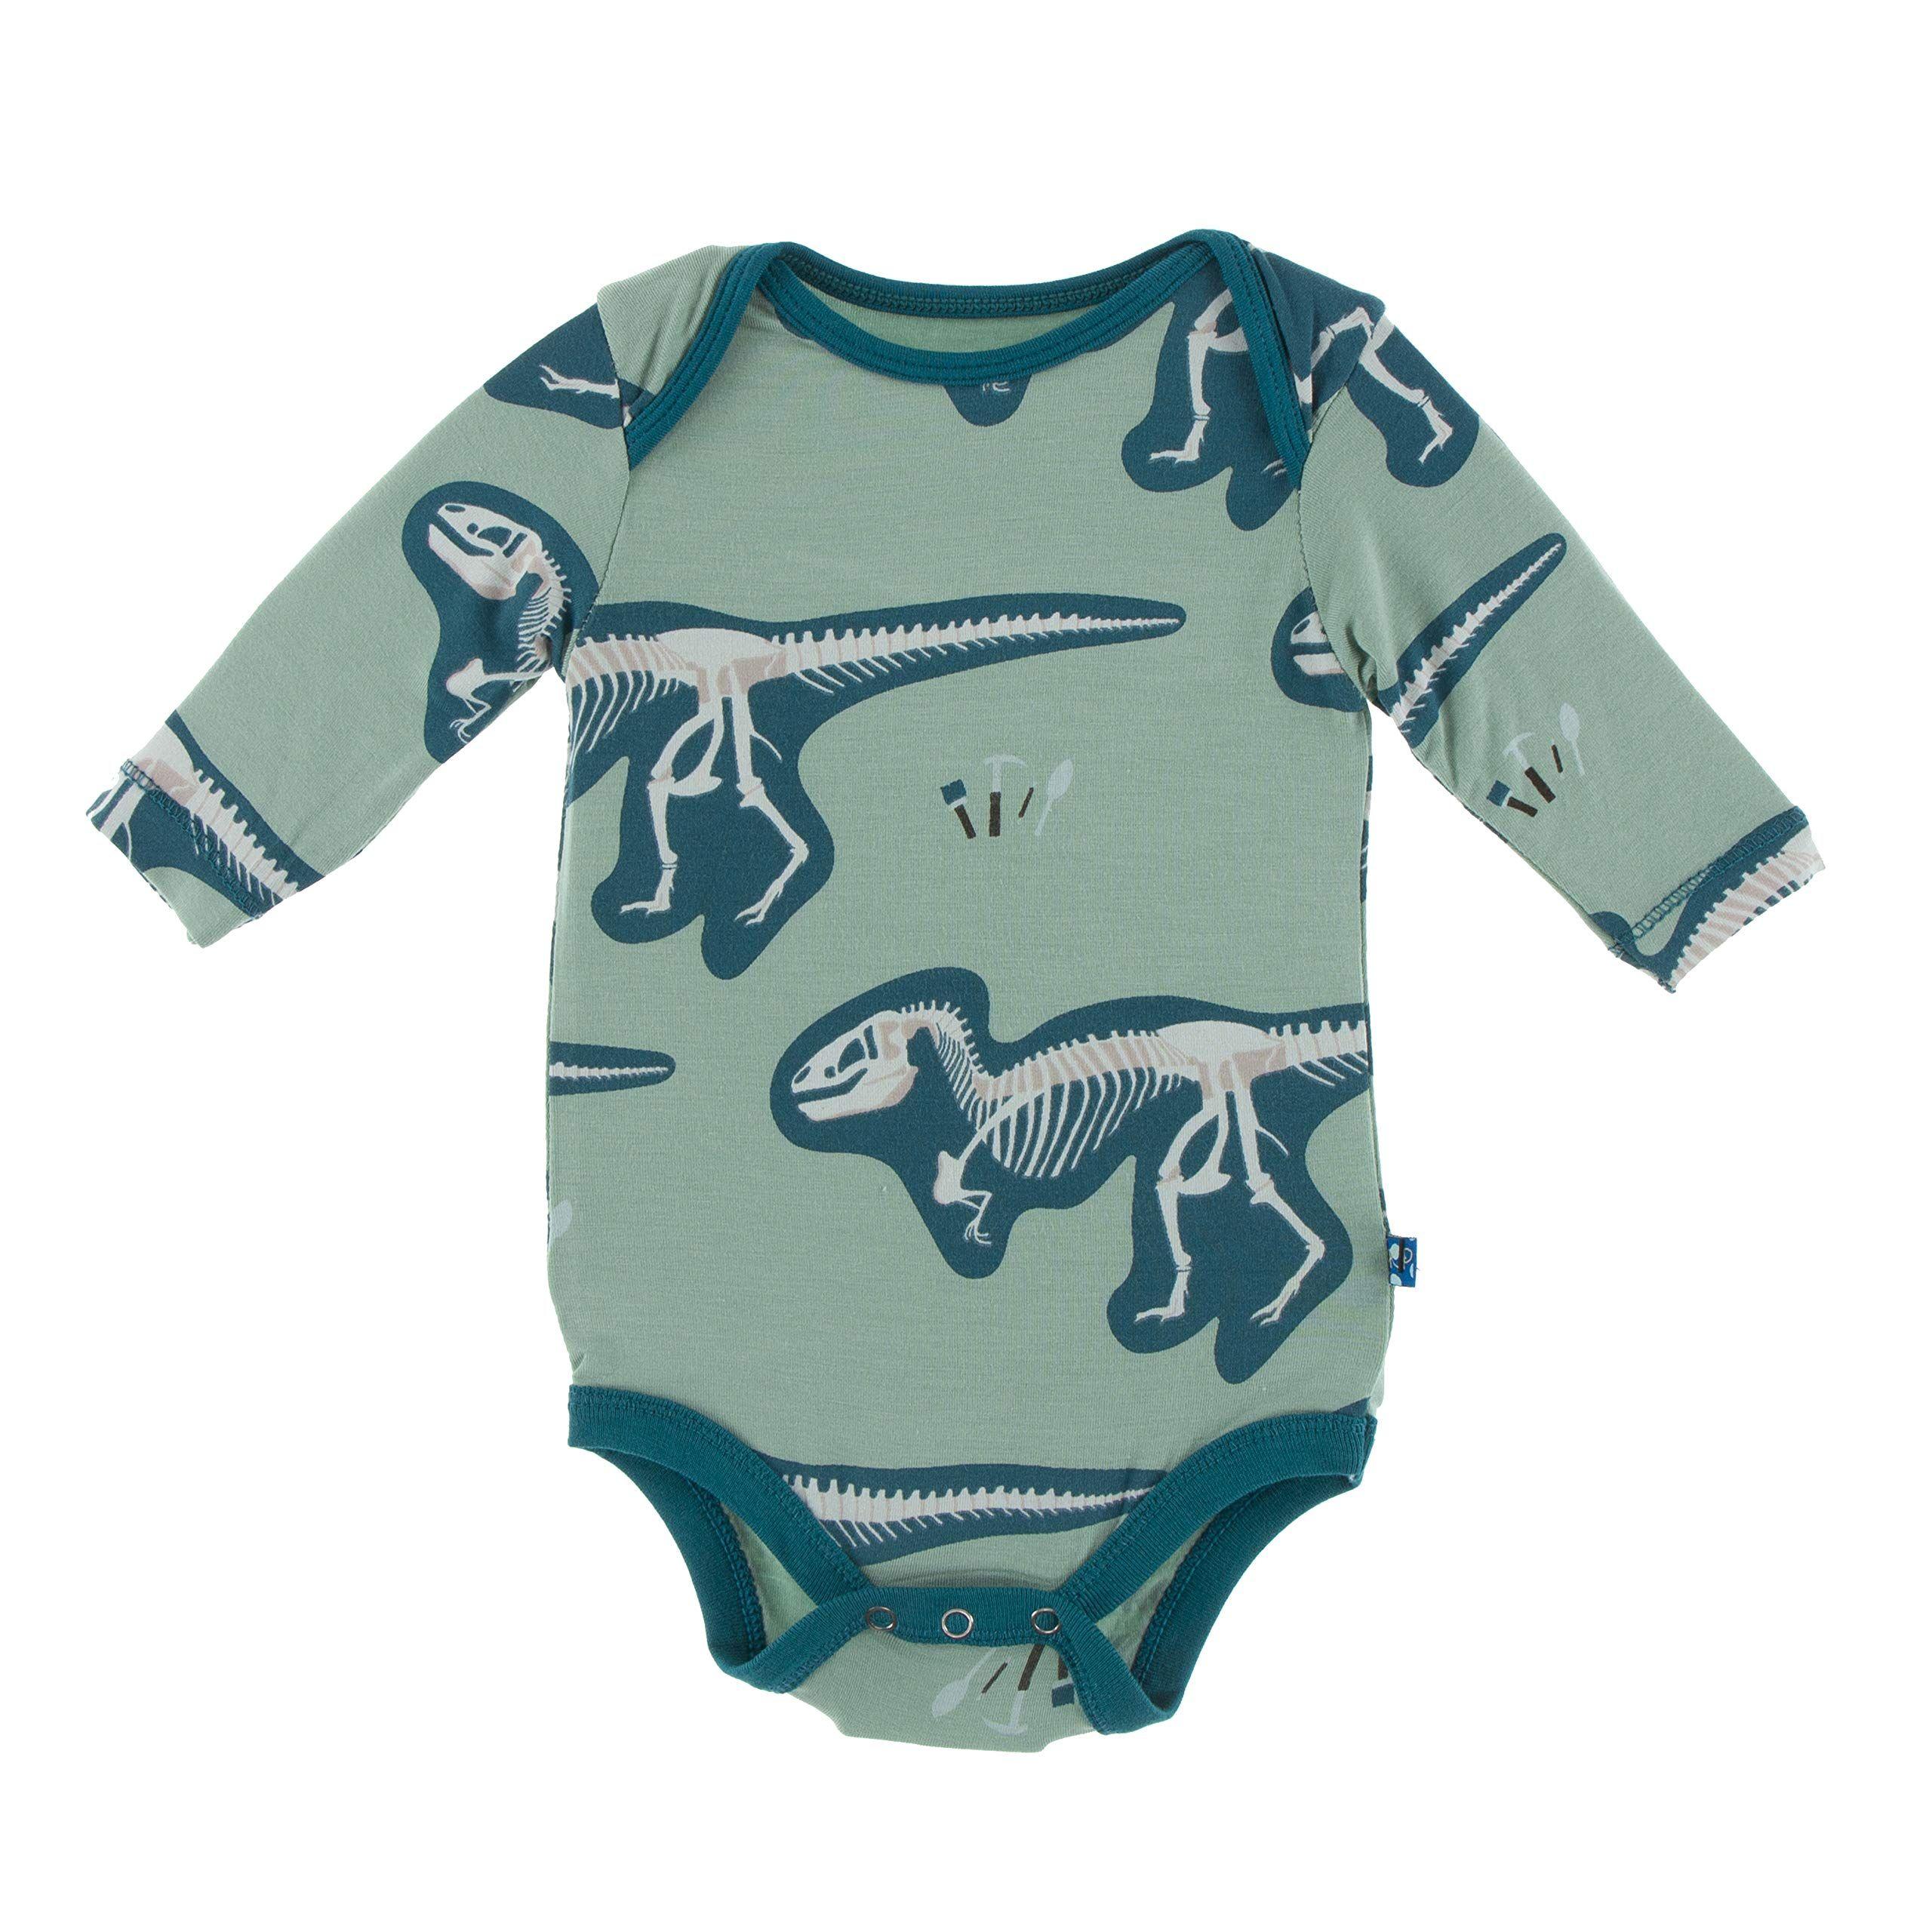 Infant Cotton Romper Pack of 4 SOBOWO Baby Boys Girls Long-Sleeve Bodysuit Unisex Baby Solid Bodysuit